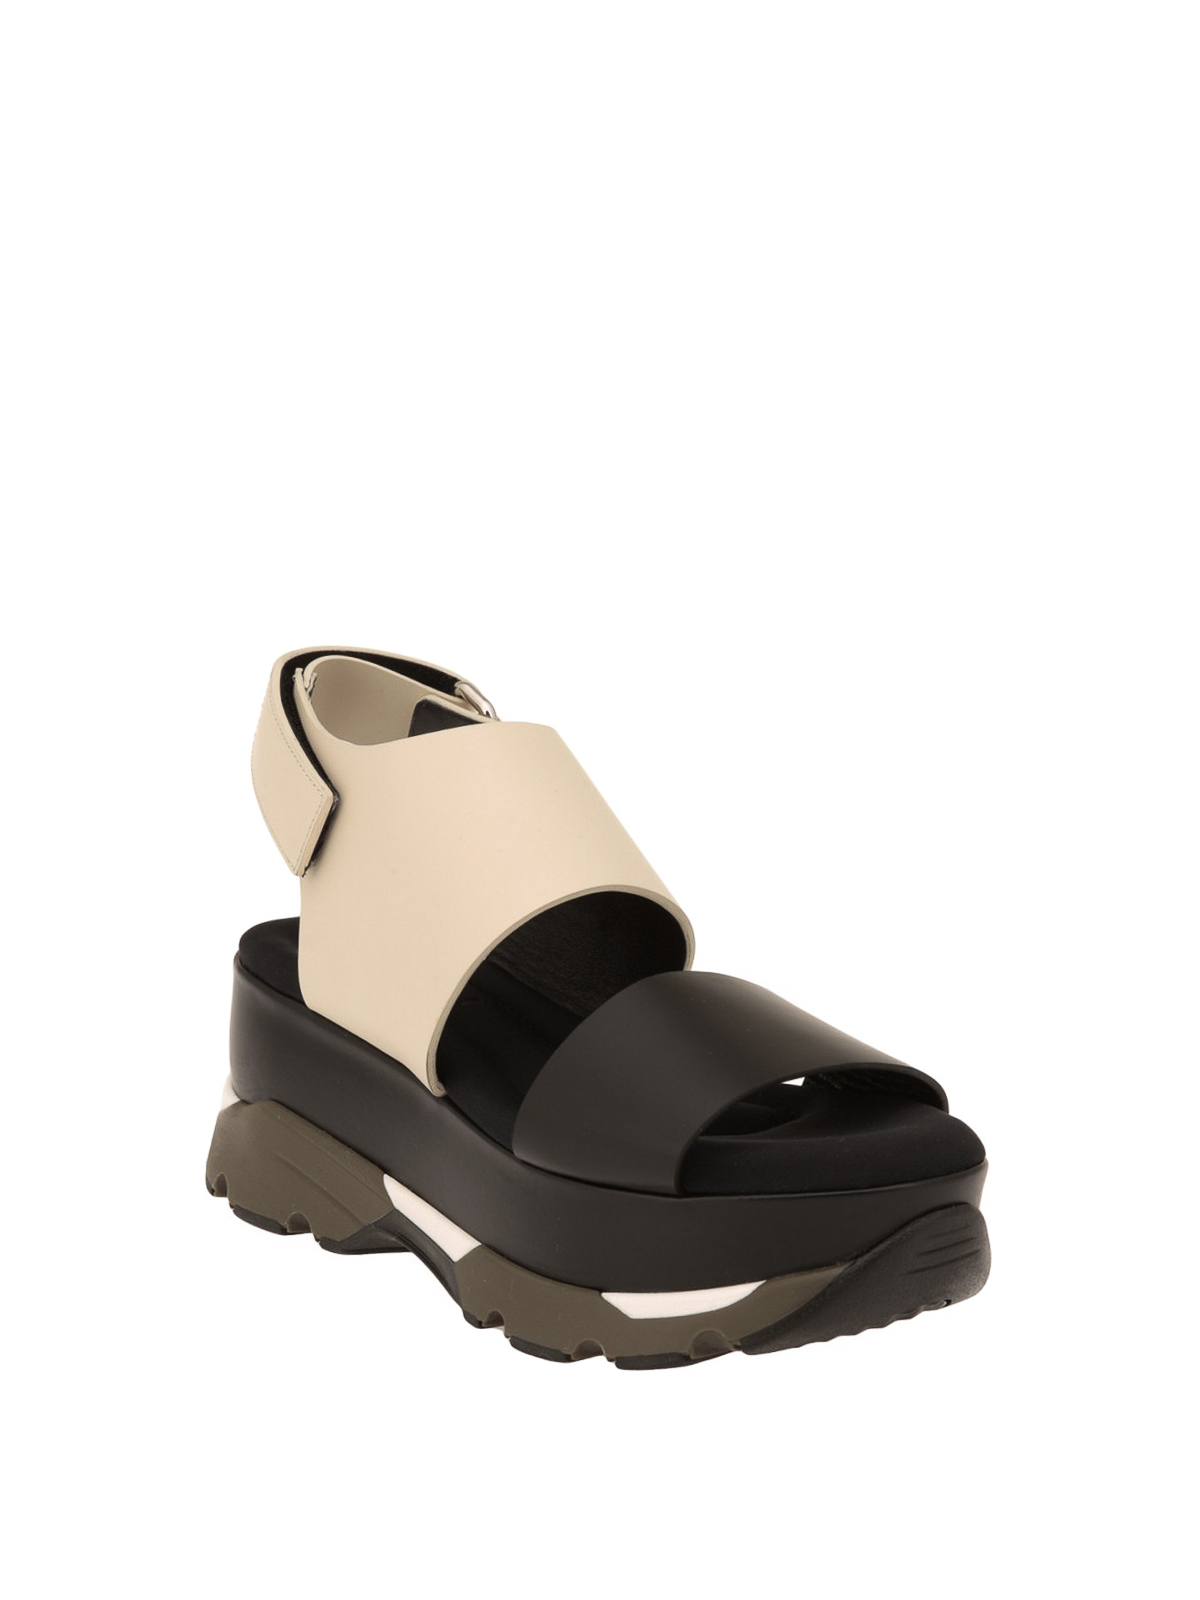 Marni - Leather platform sandals